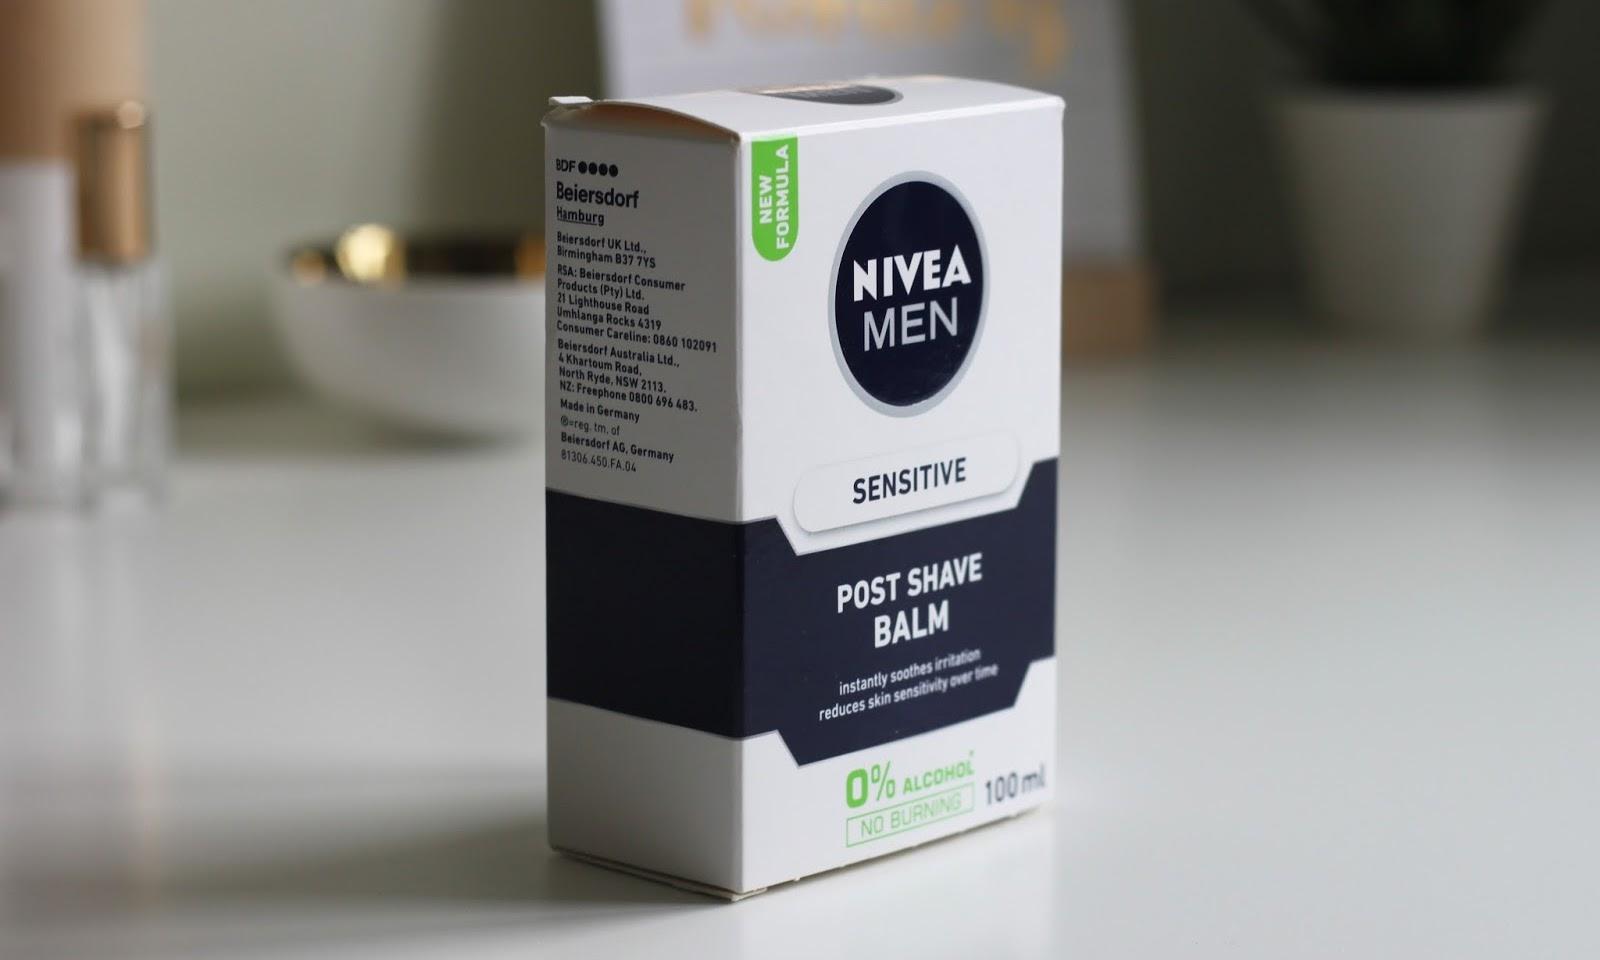 Clashing Time tries Nivea Post Shave Balm as a primer